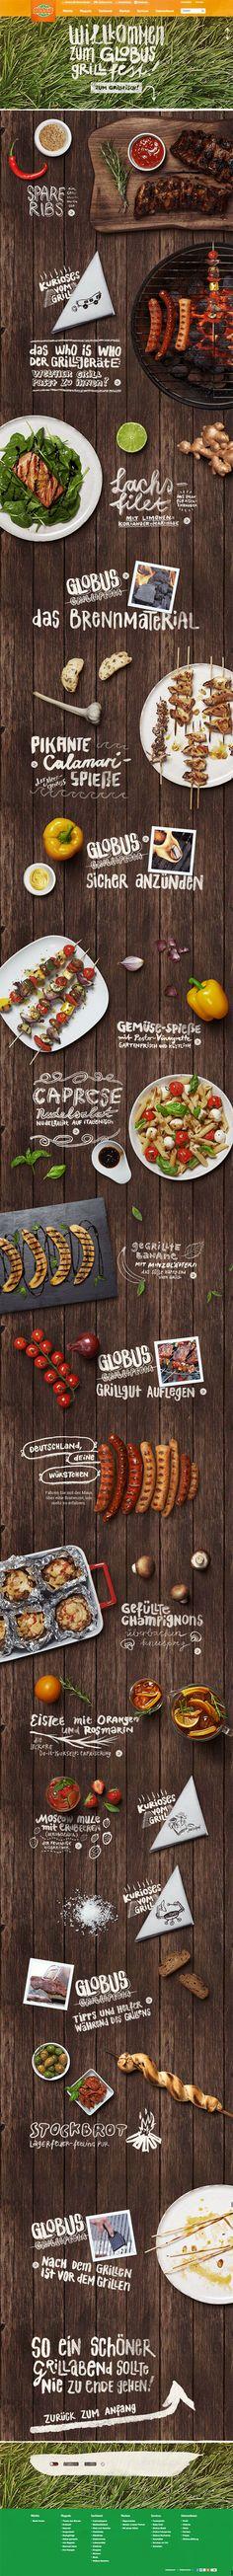 The Globus Grillfest by Kathrin Schmitz, via Behance | #webdesign #it #web #design #layout #userinterface #website #webdesign